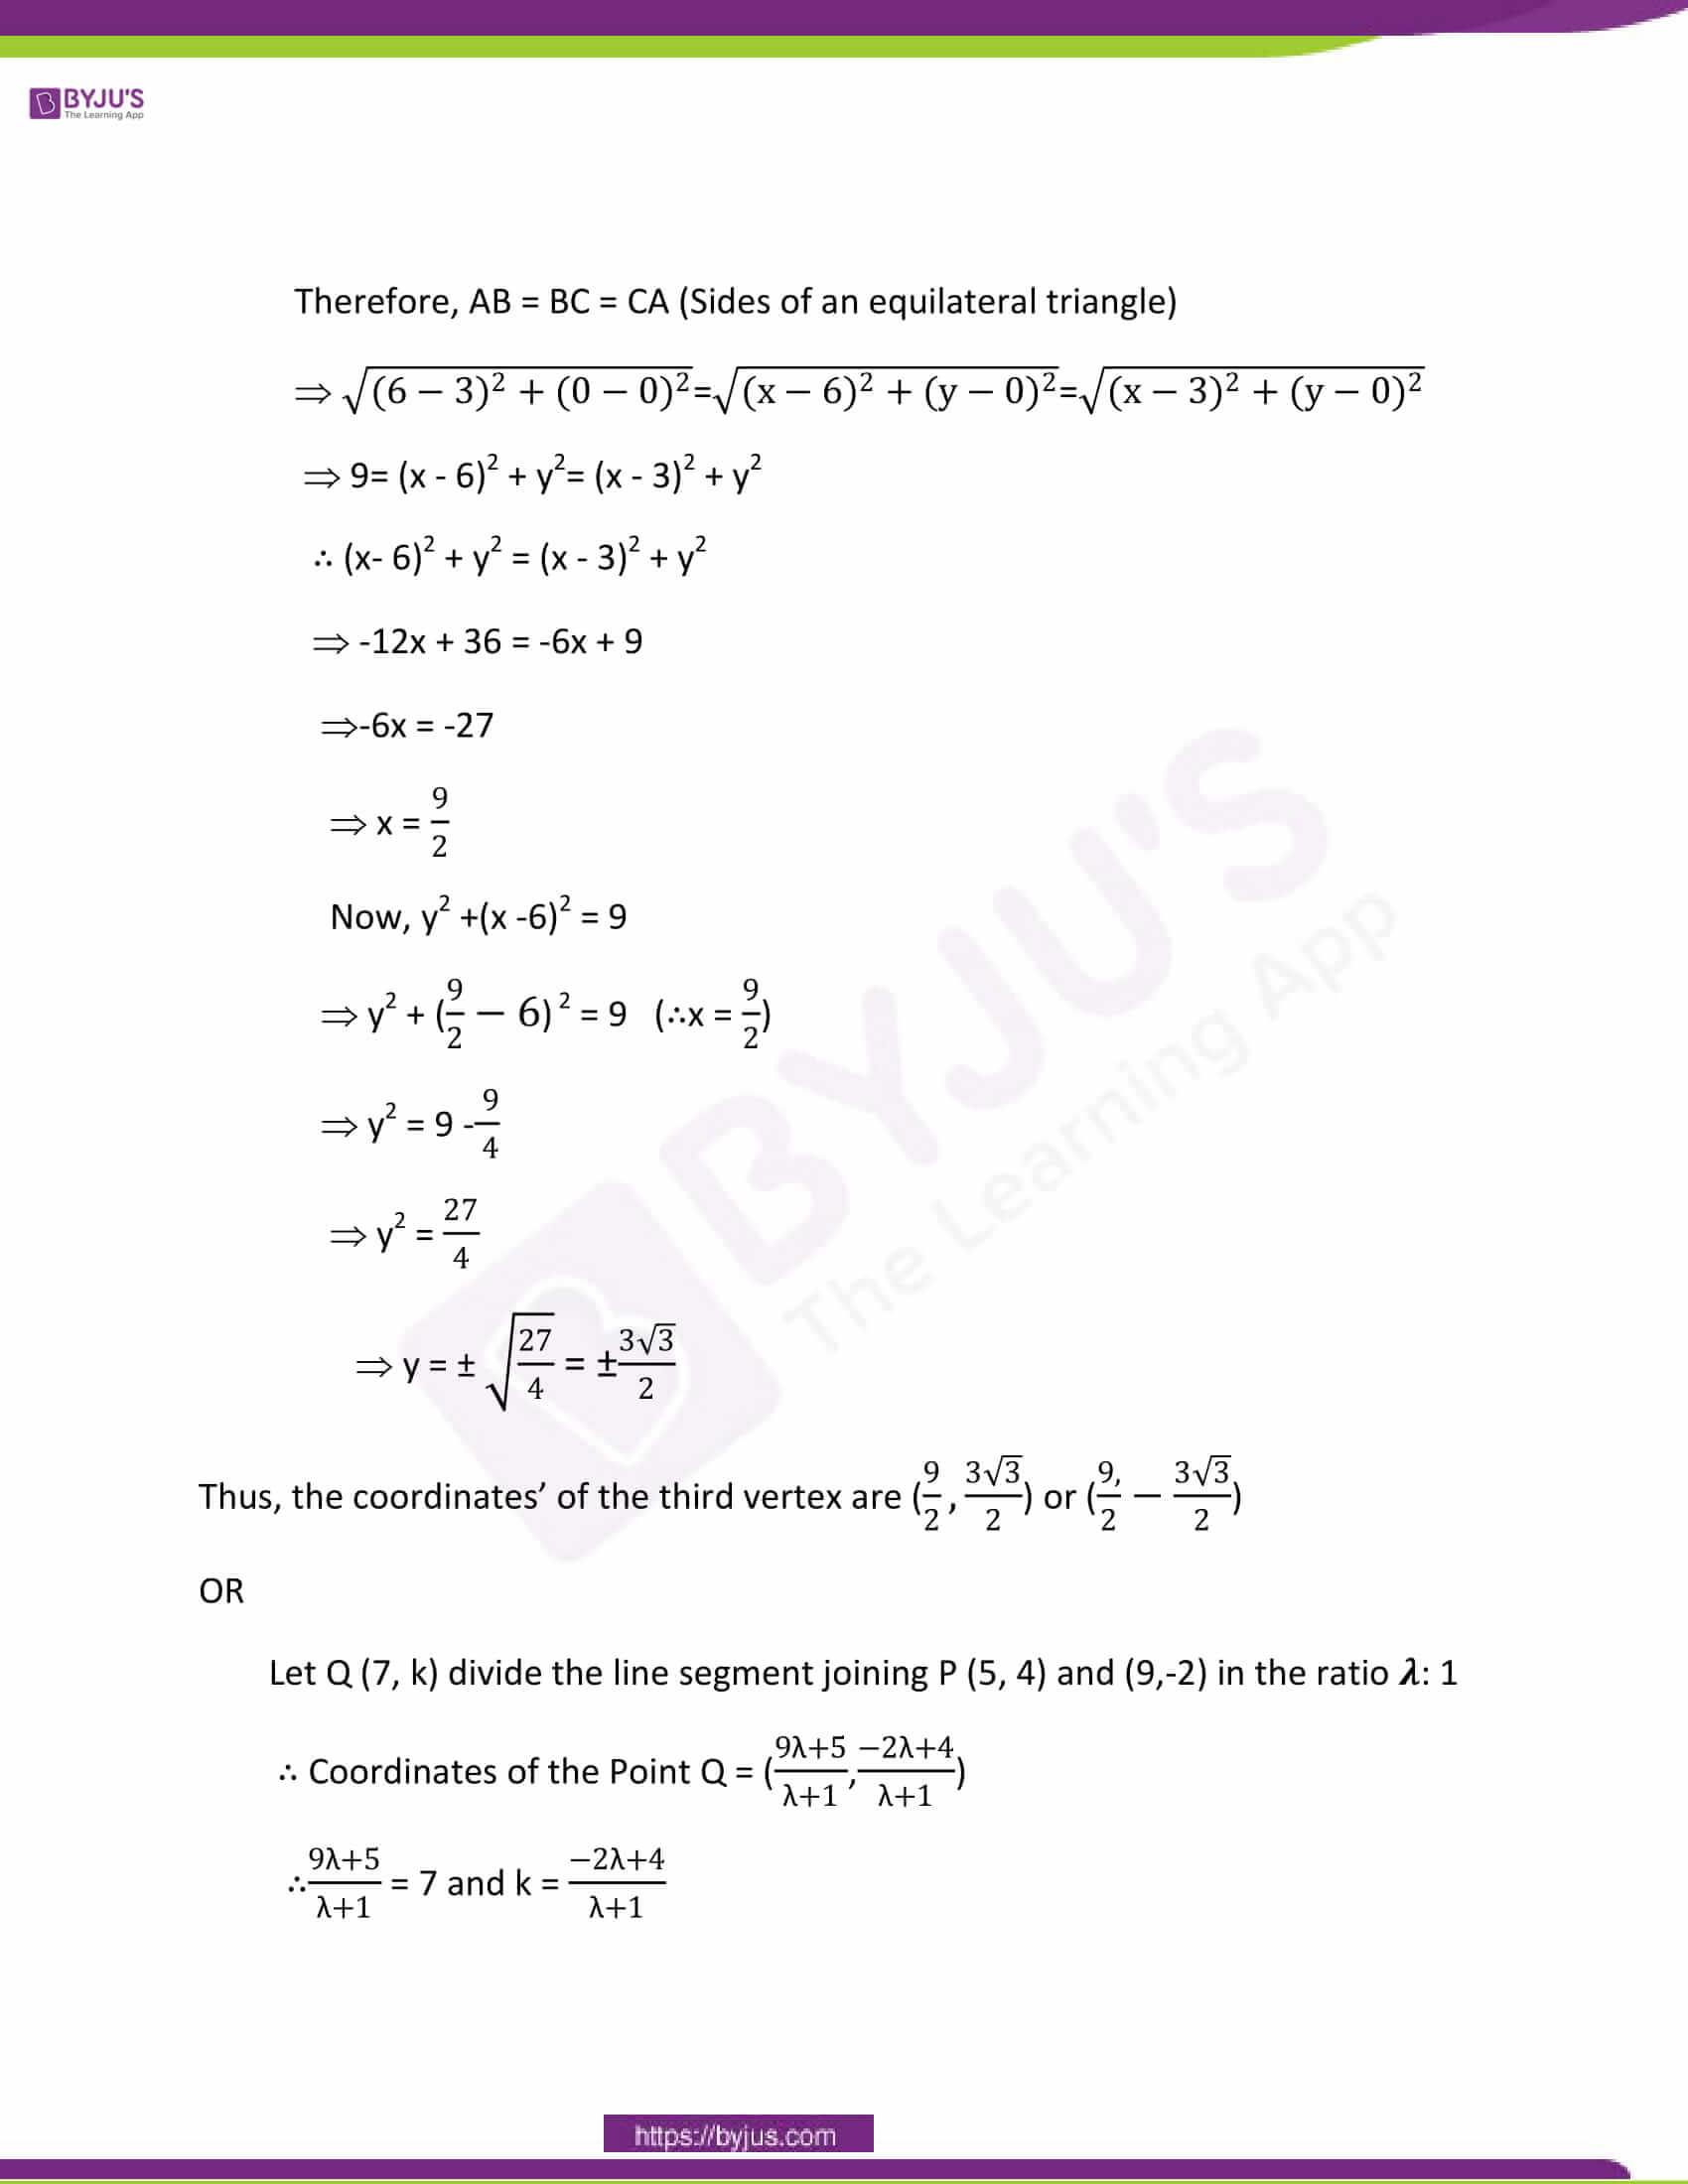 CBSE Class 10 Maths Papers Solution 2011 12